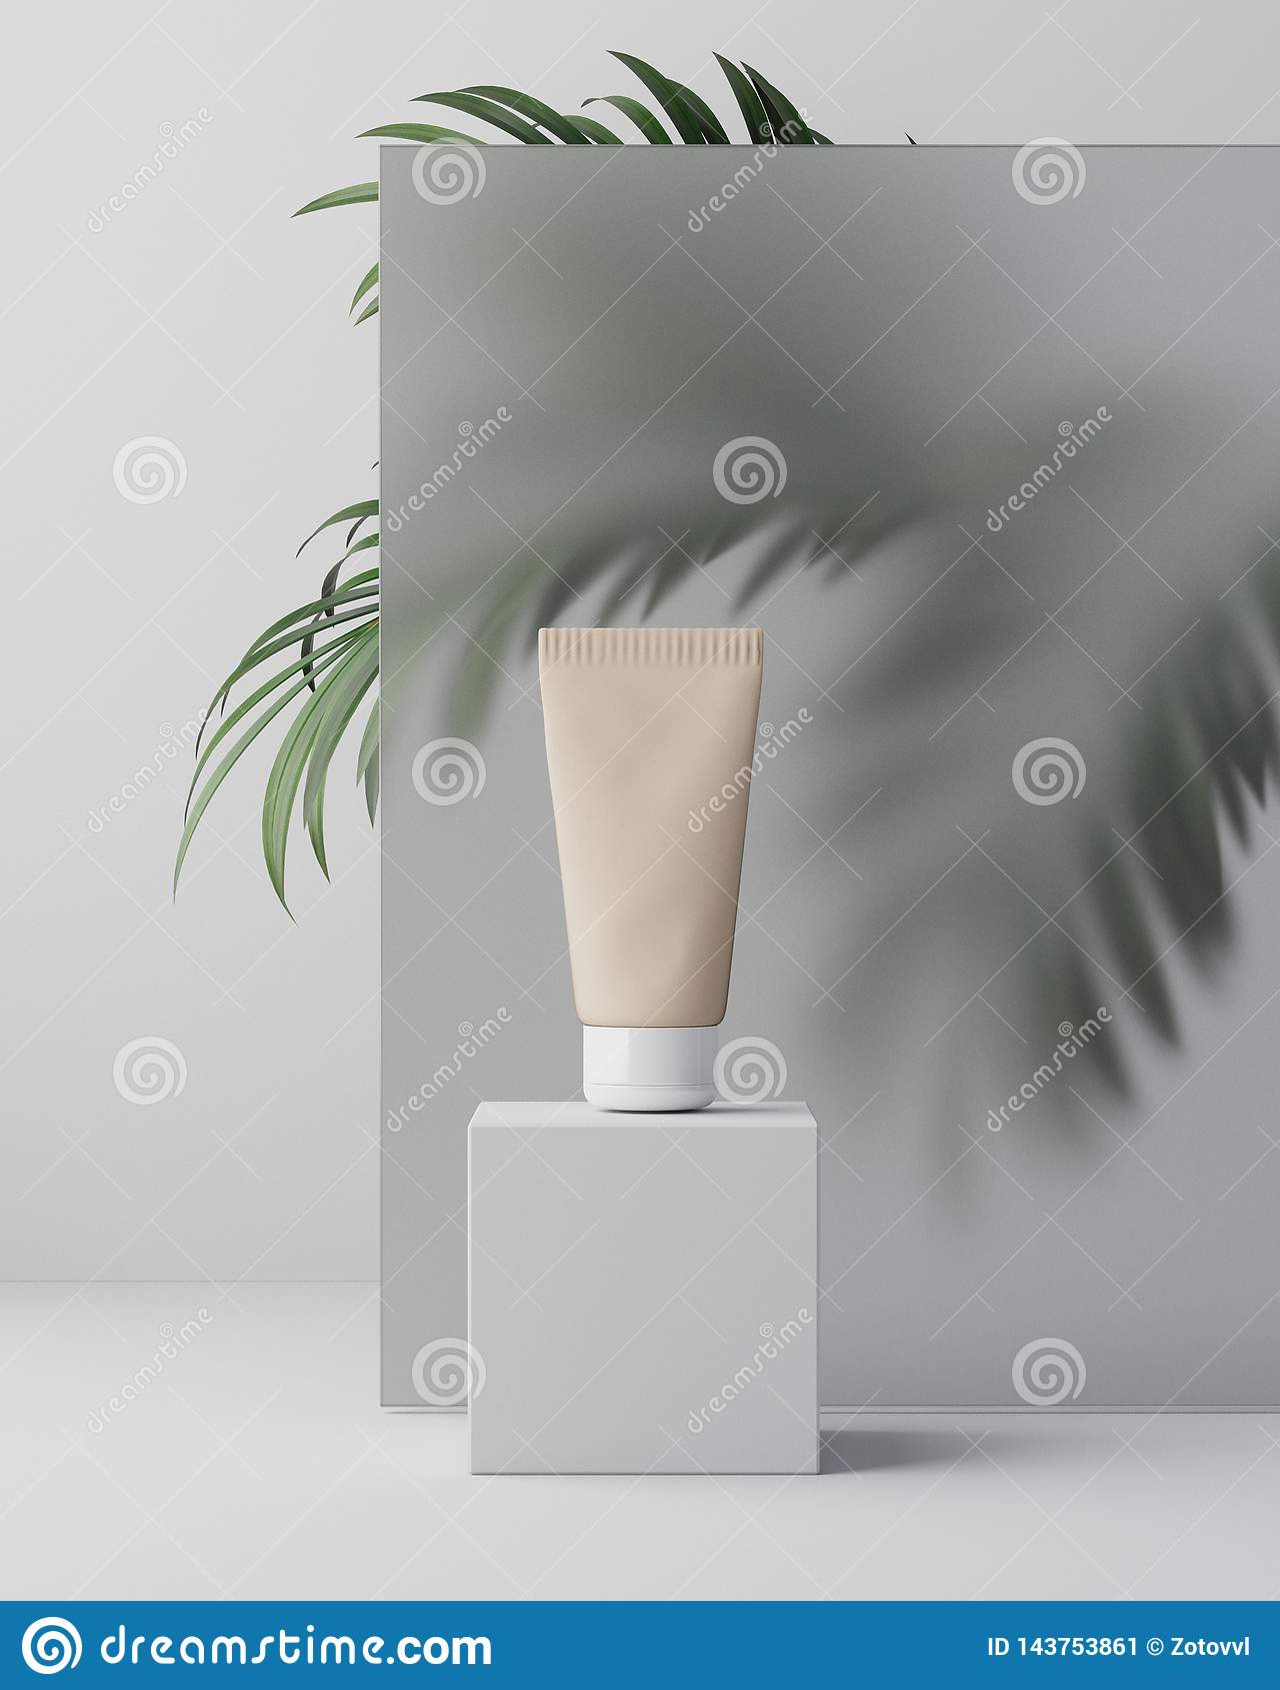 3d illustartion 草本在塑料瓶子的皮肤学化妆卫生奶油色skincare产品在玻璃背景与